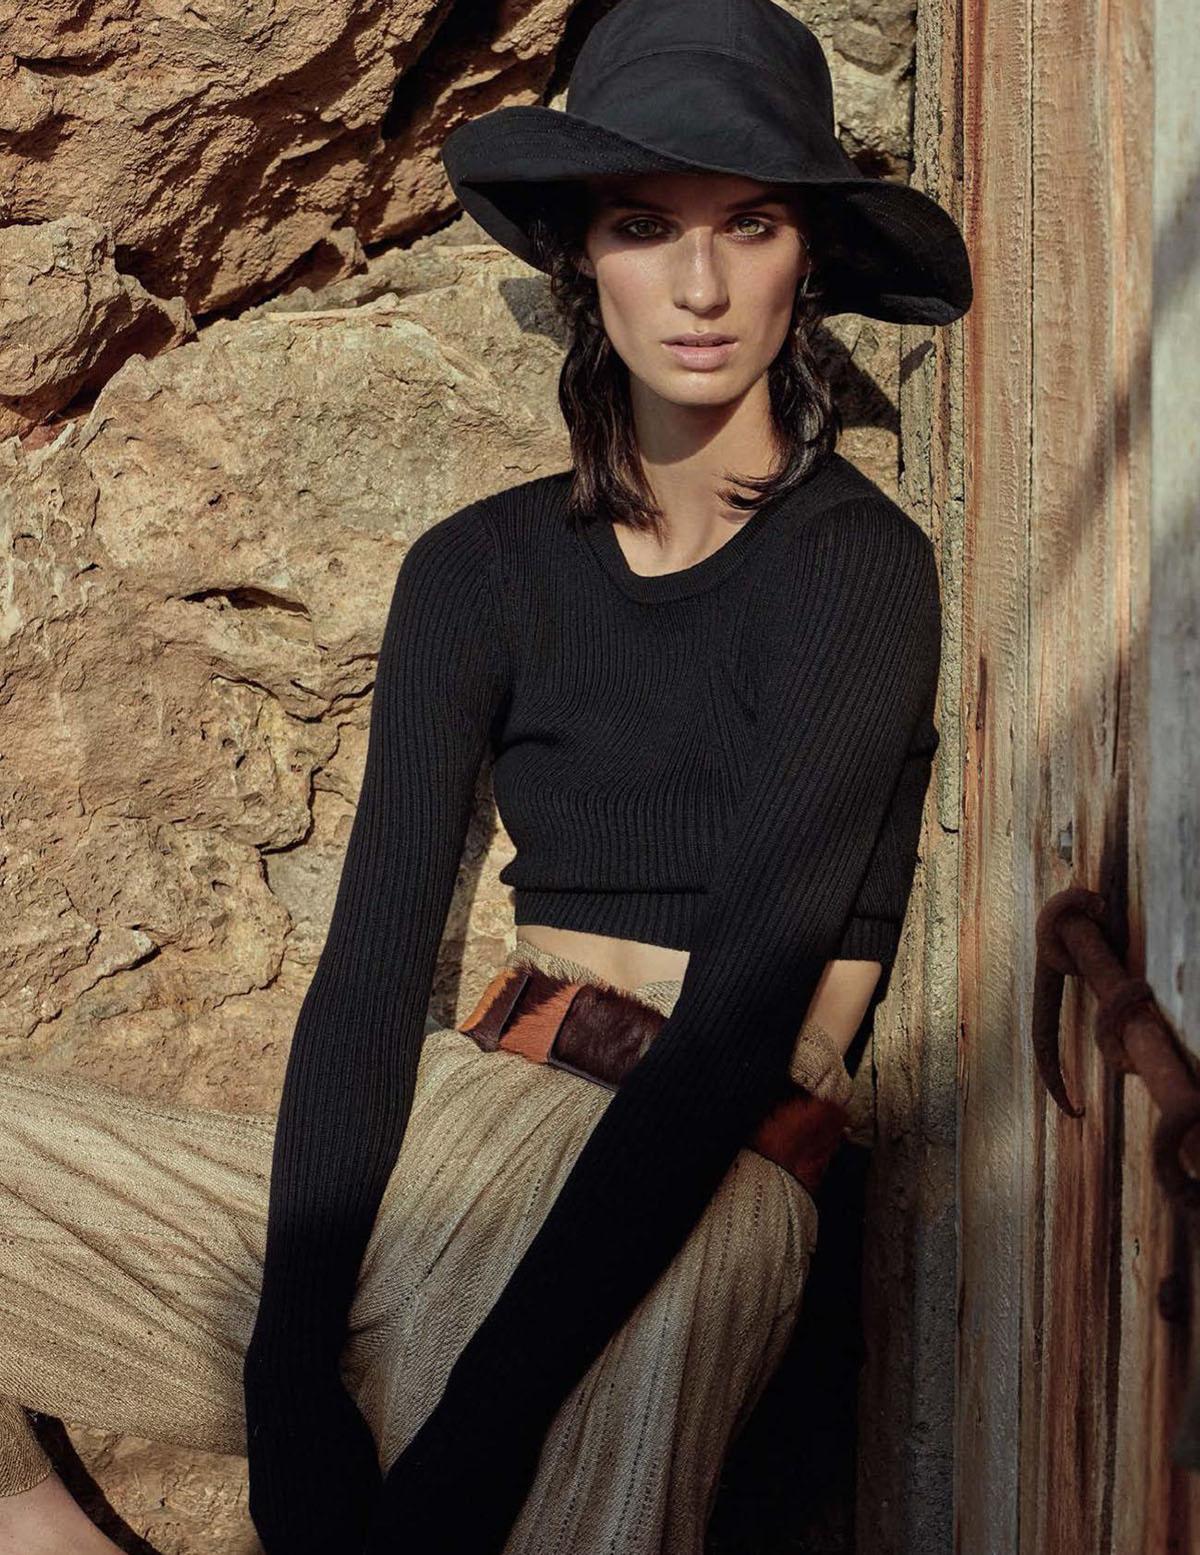 кроп-топ из шерсти мериноса, Michael Kors Collection; брюки из шелка, Mes Demoiselles Paris; шляпа, Holland & Holland; ремень, Prada